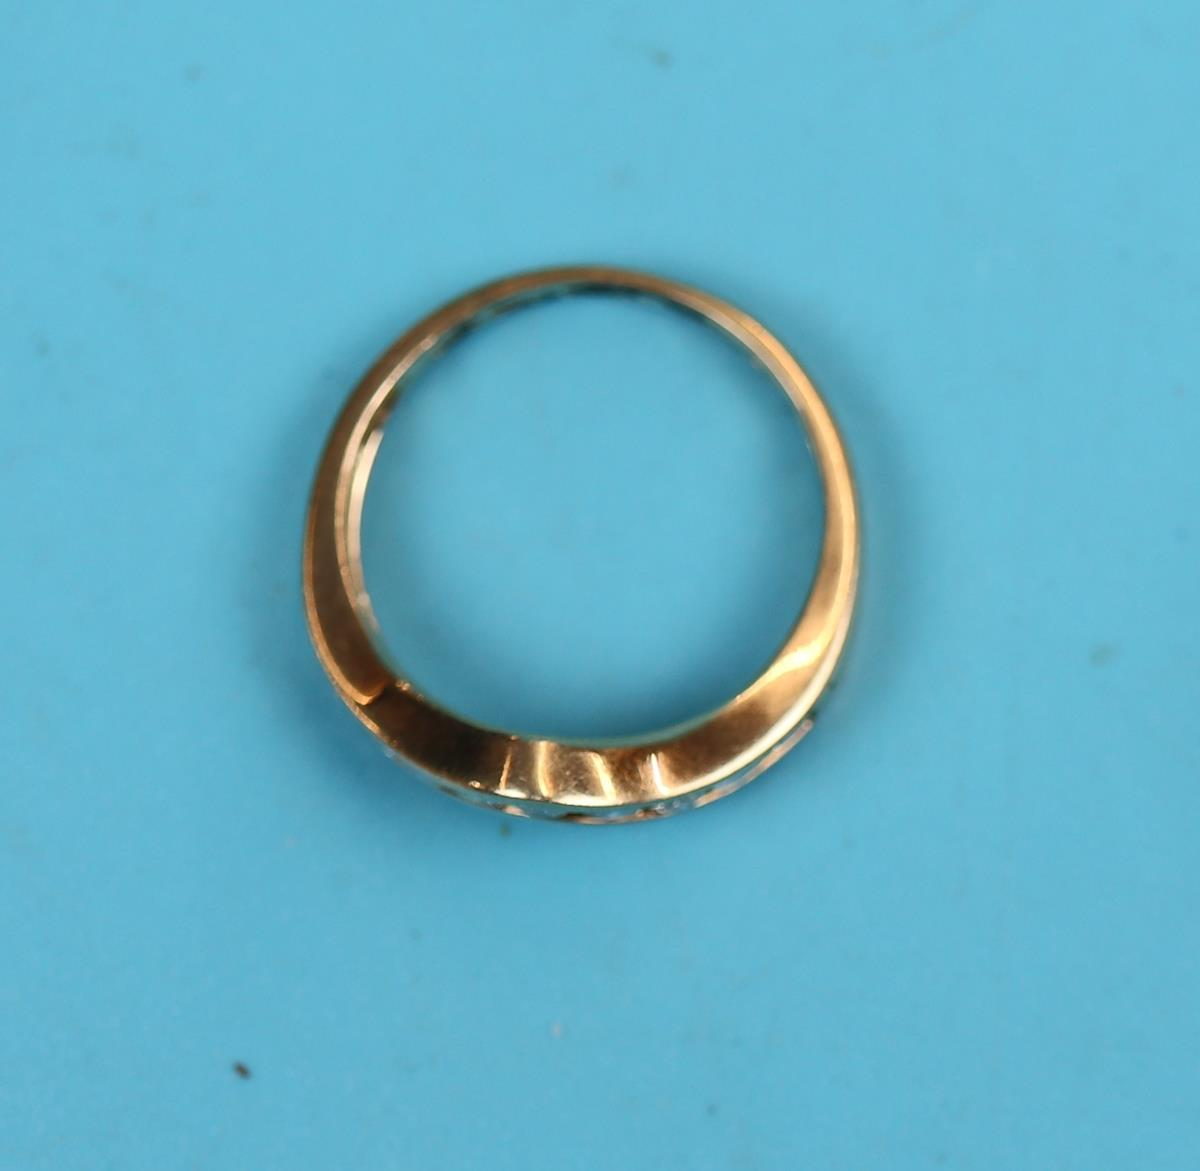 Gold channel set diamond wishbone ring (.5ct diamonds) - Image 2 of 2